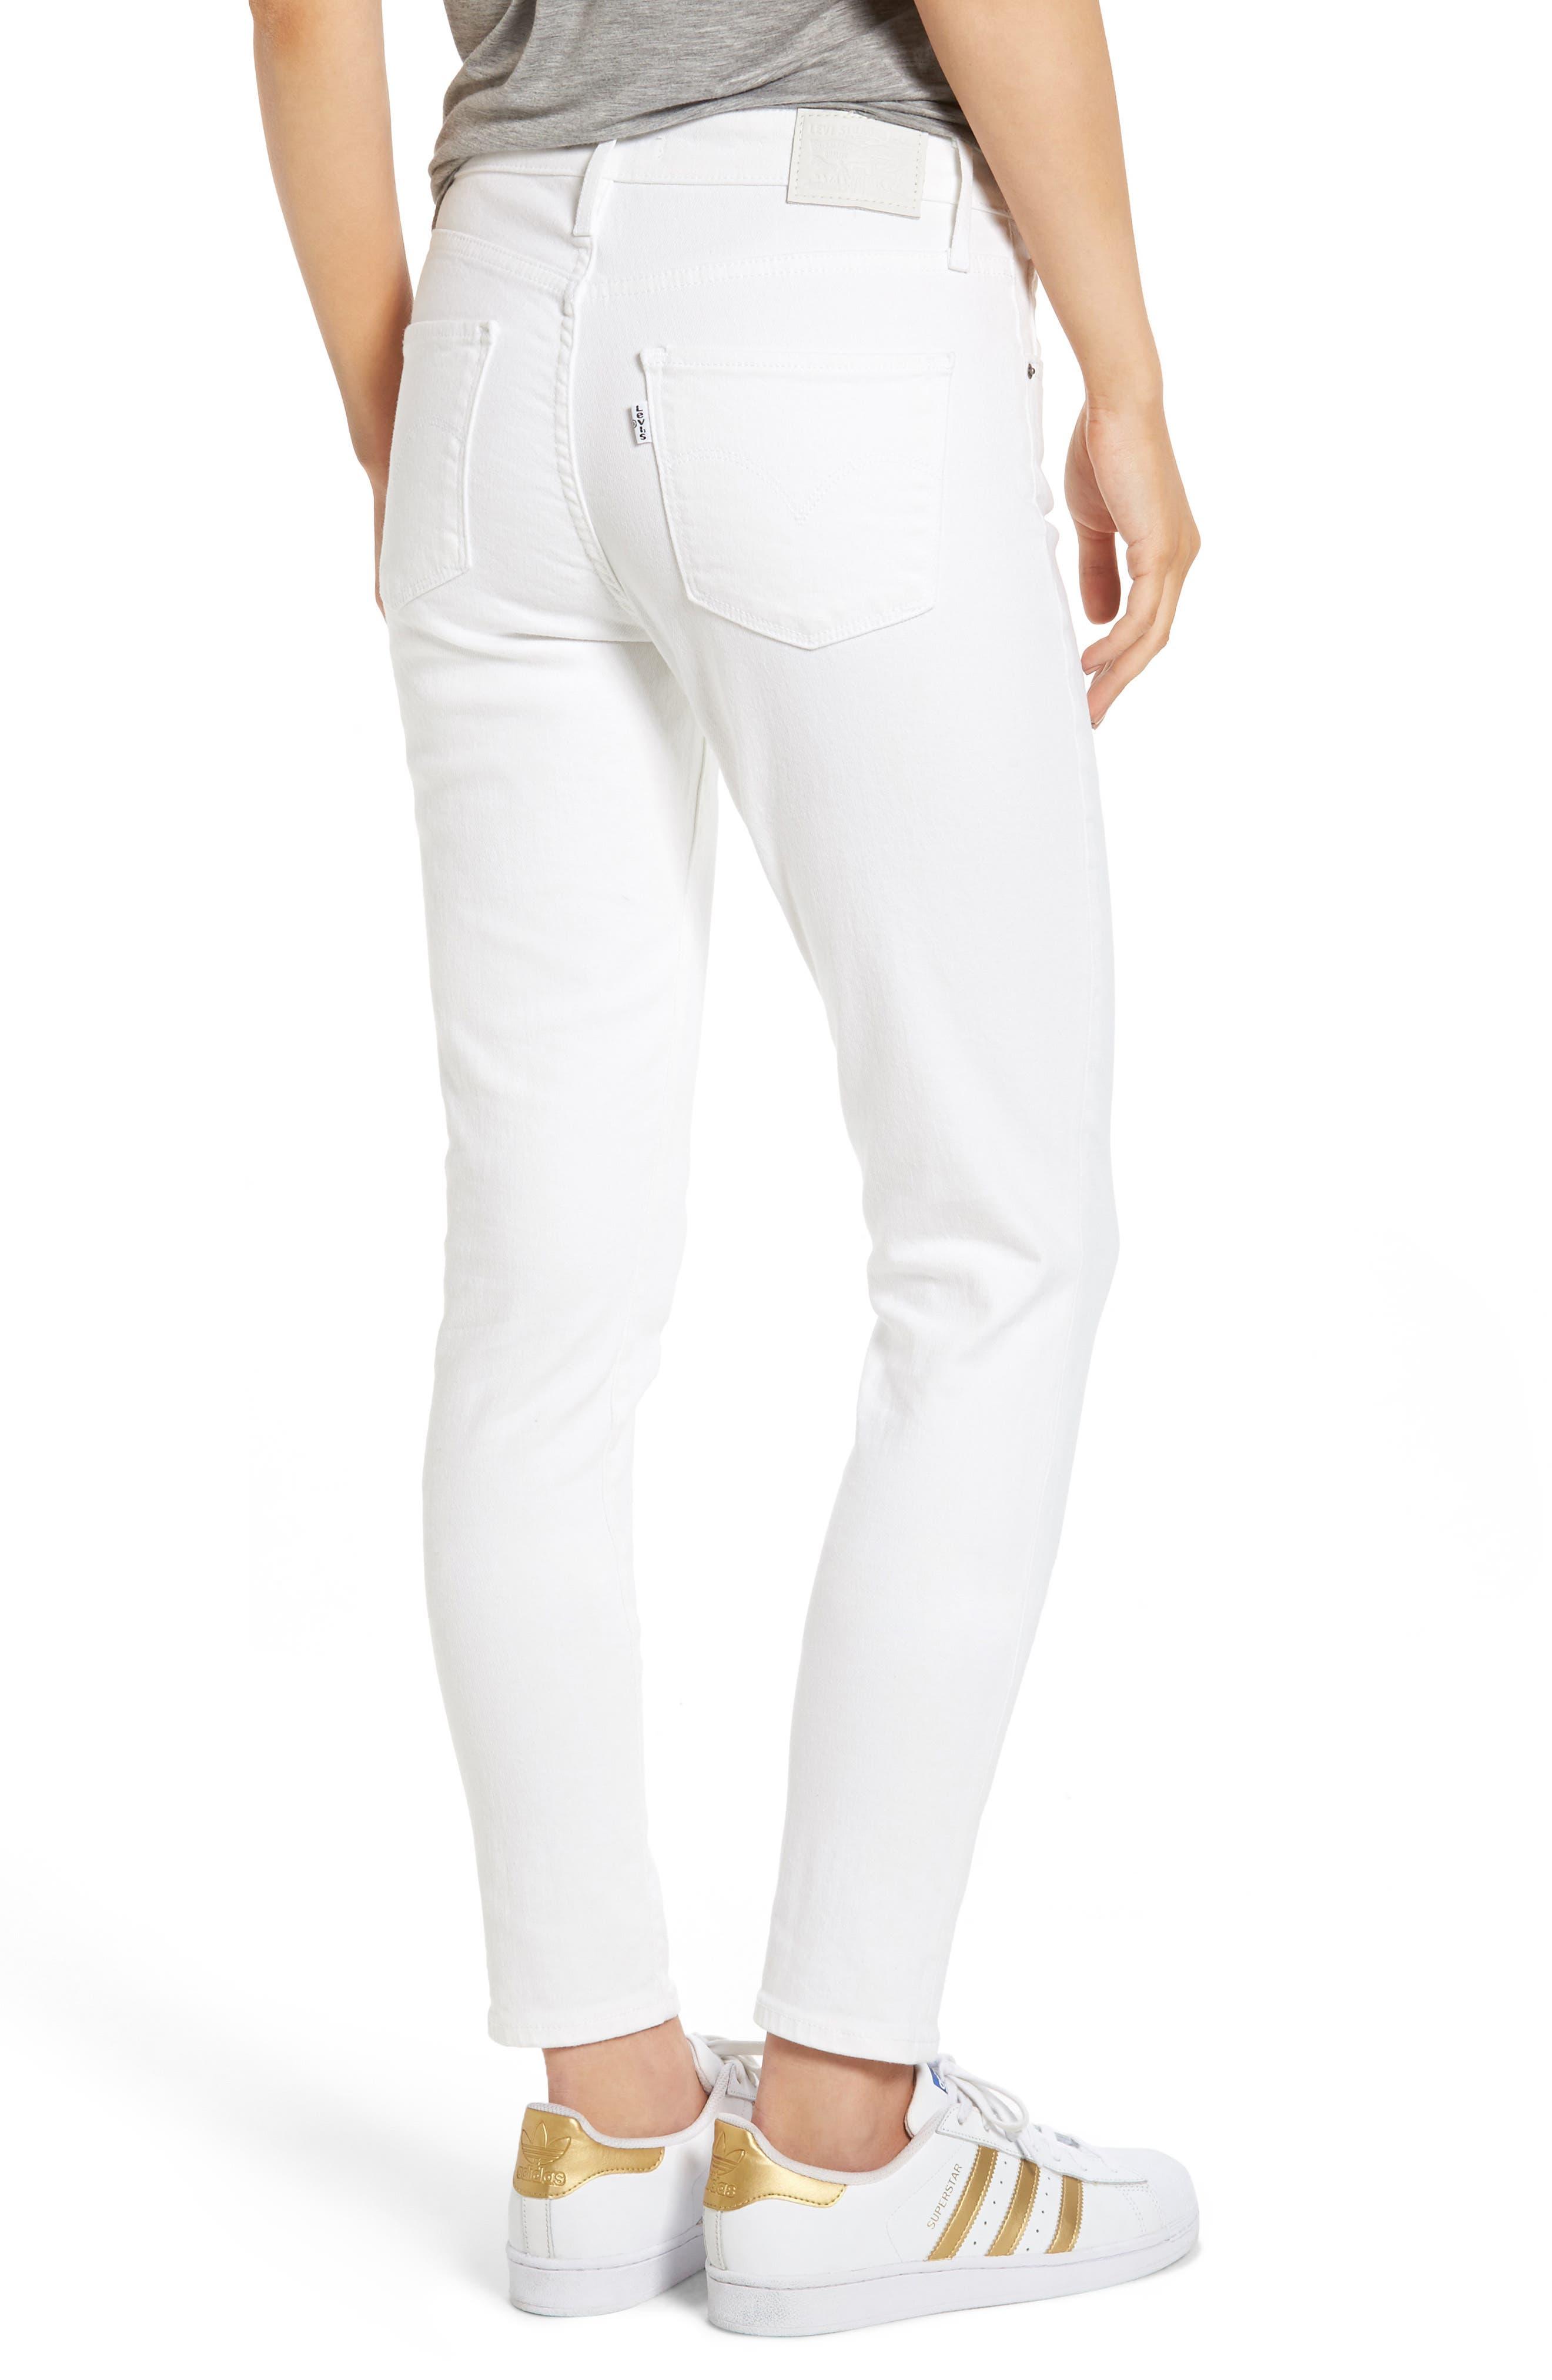 Alternate Image 2  - Levi's® 721 High Rise Skinny Jeans